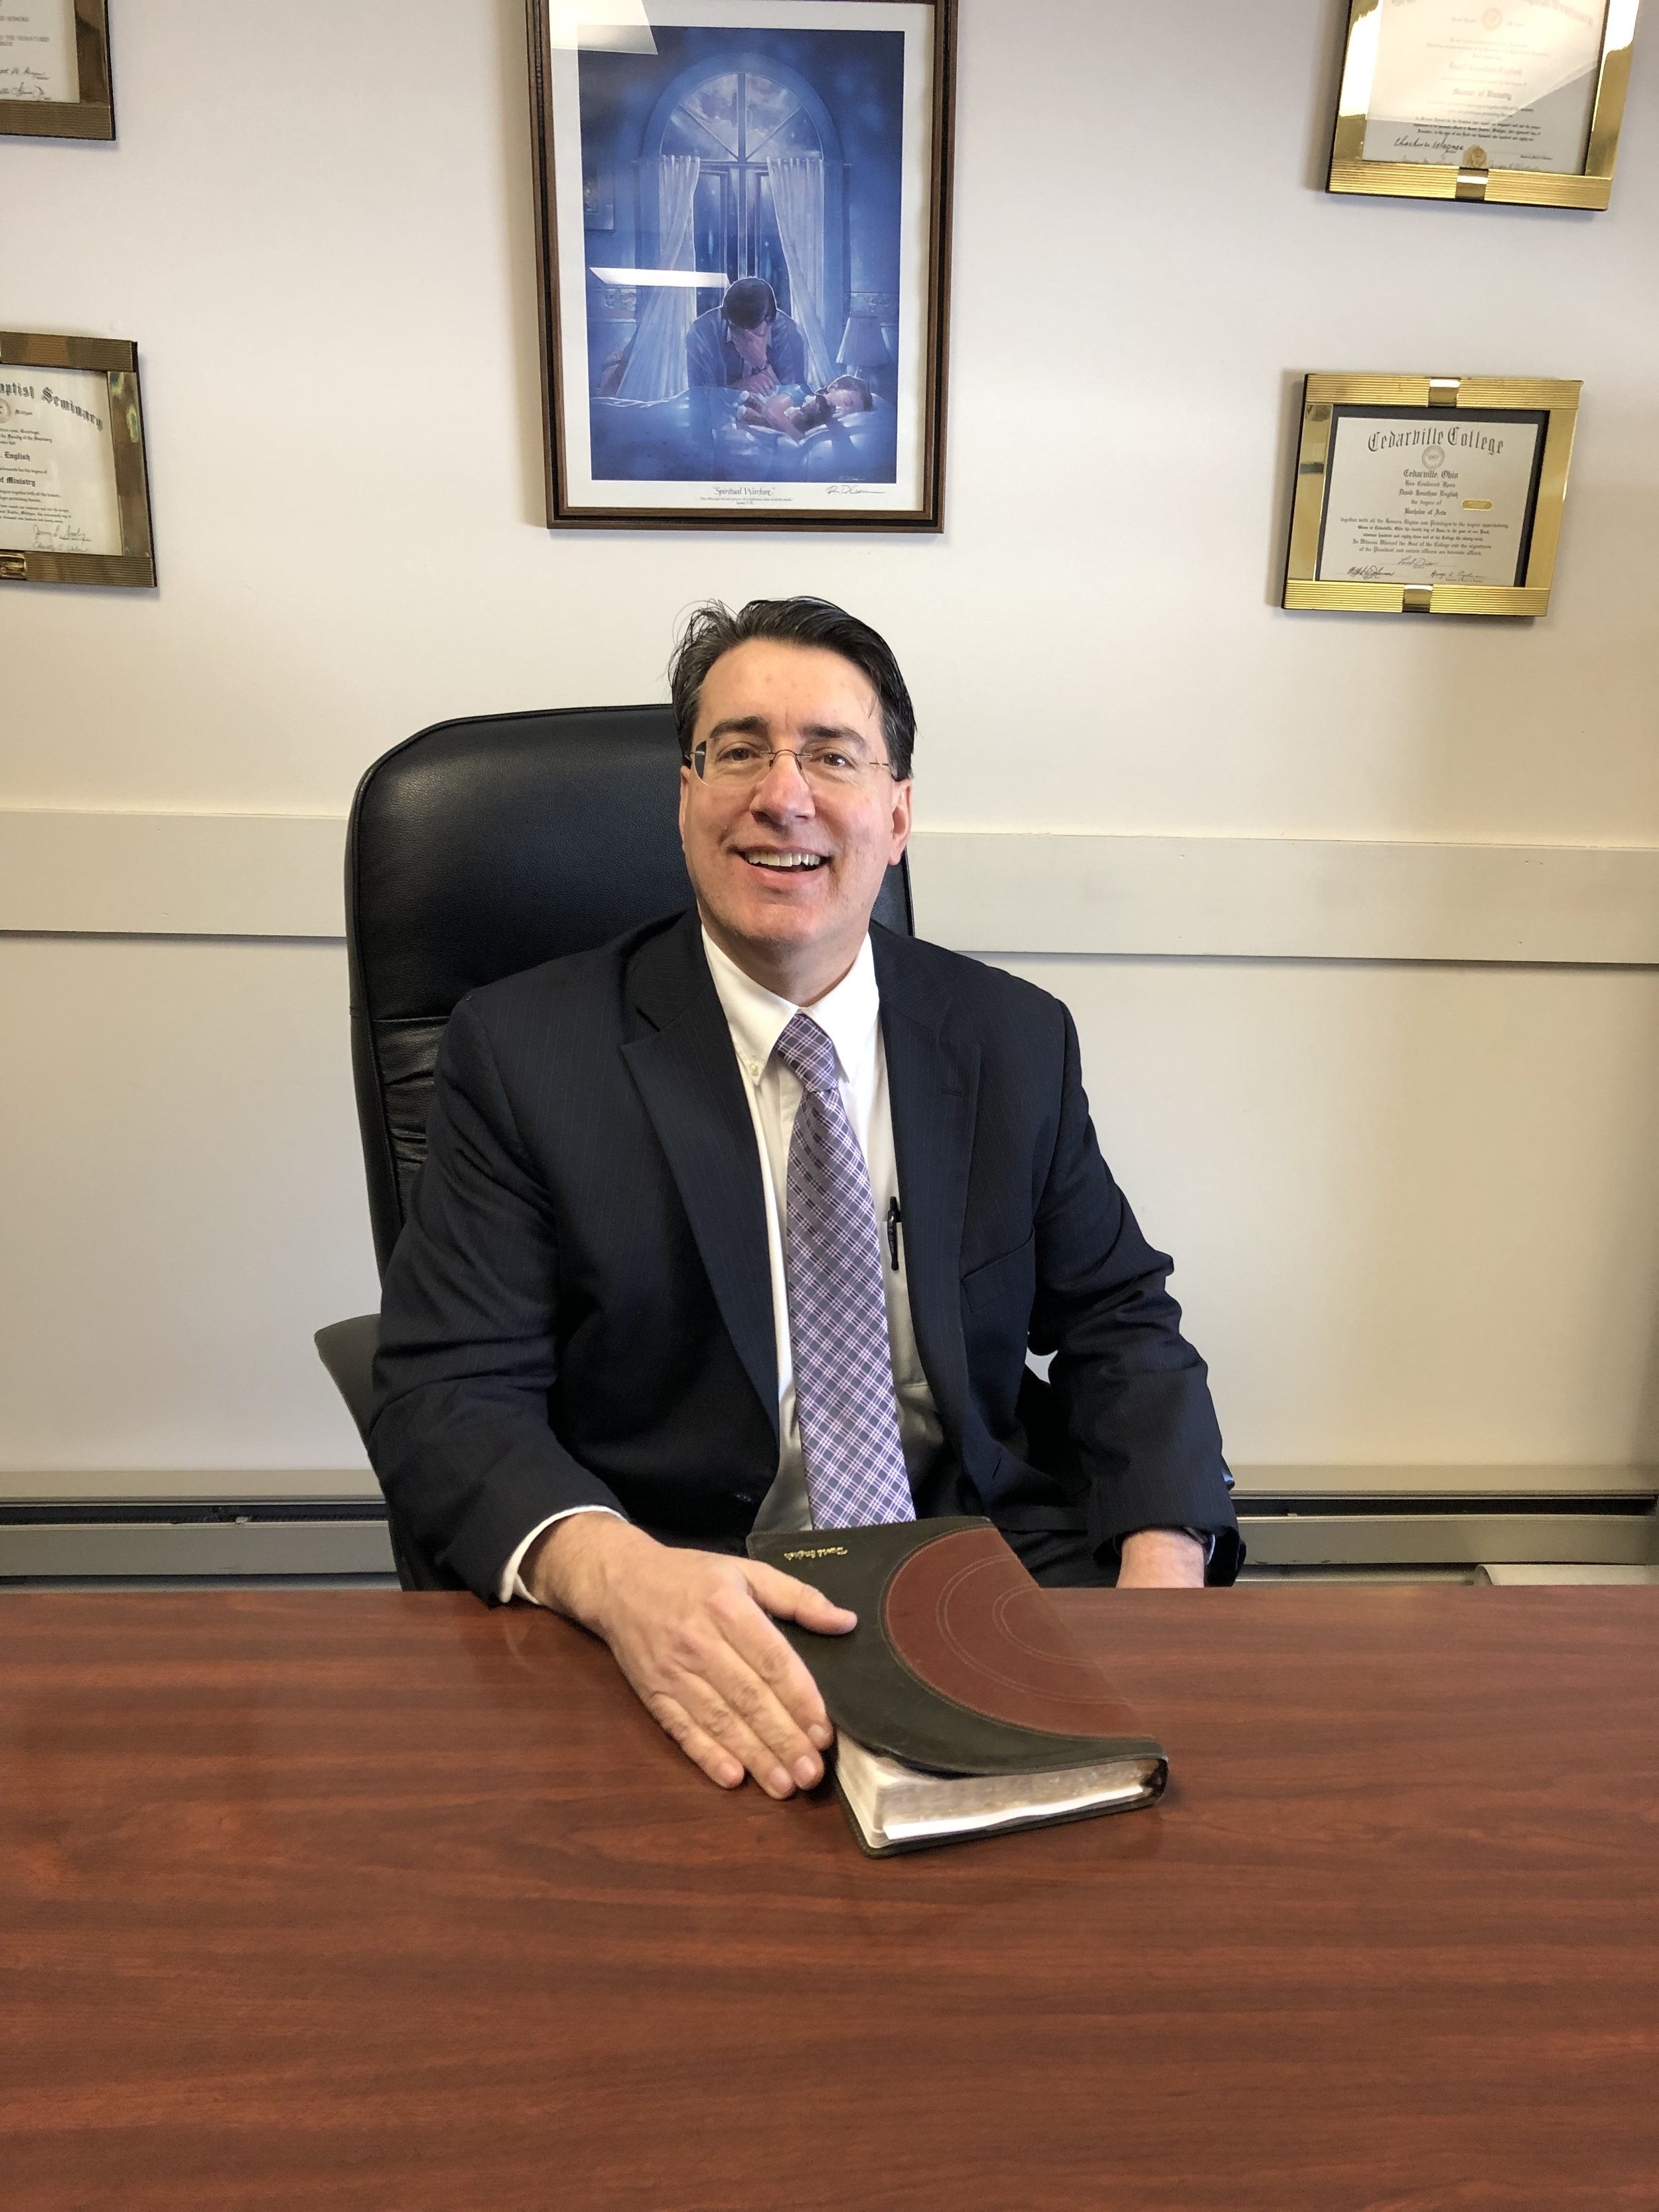 Dr. David J. English, Pastor at West Rockport Baptist Church